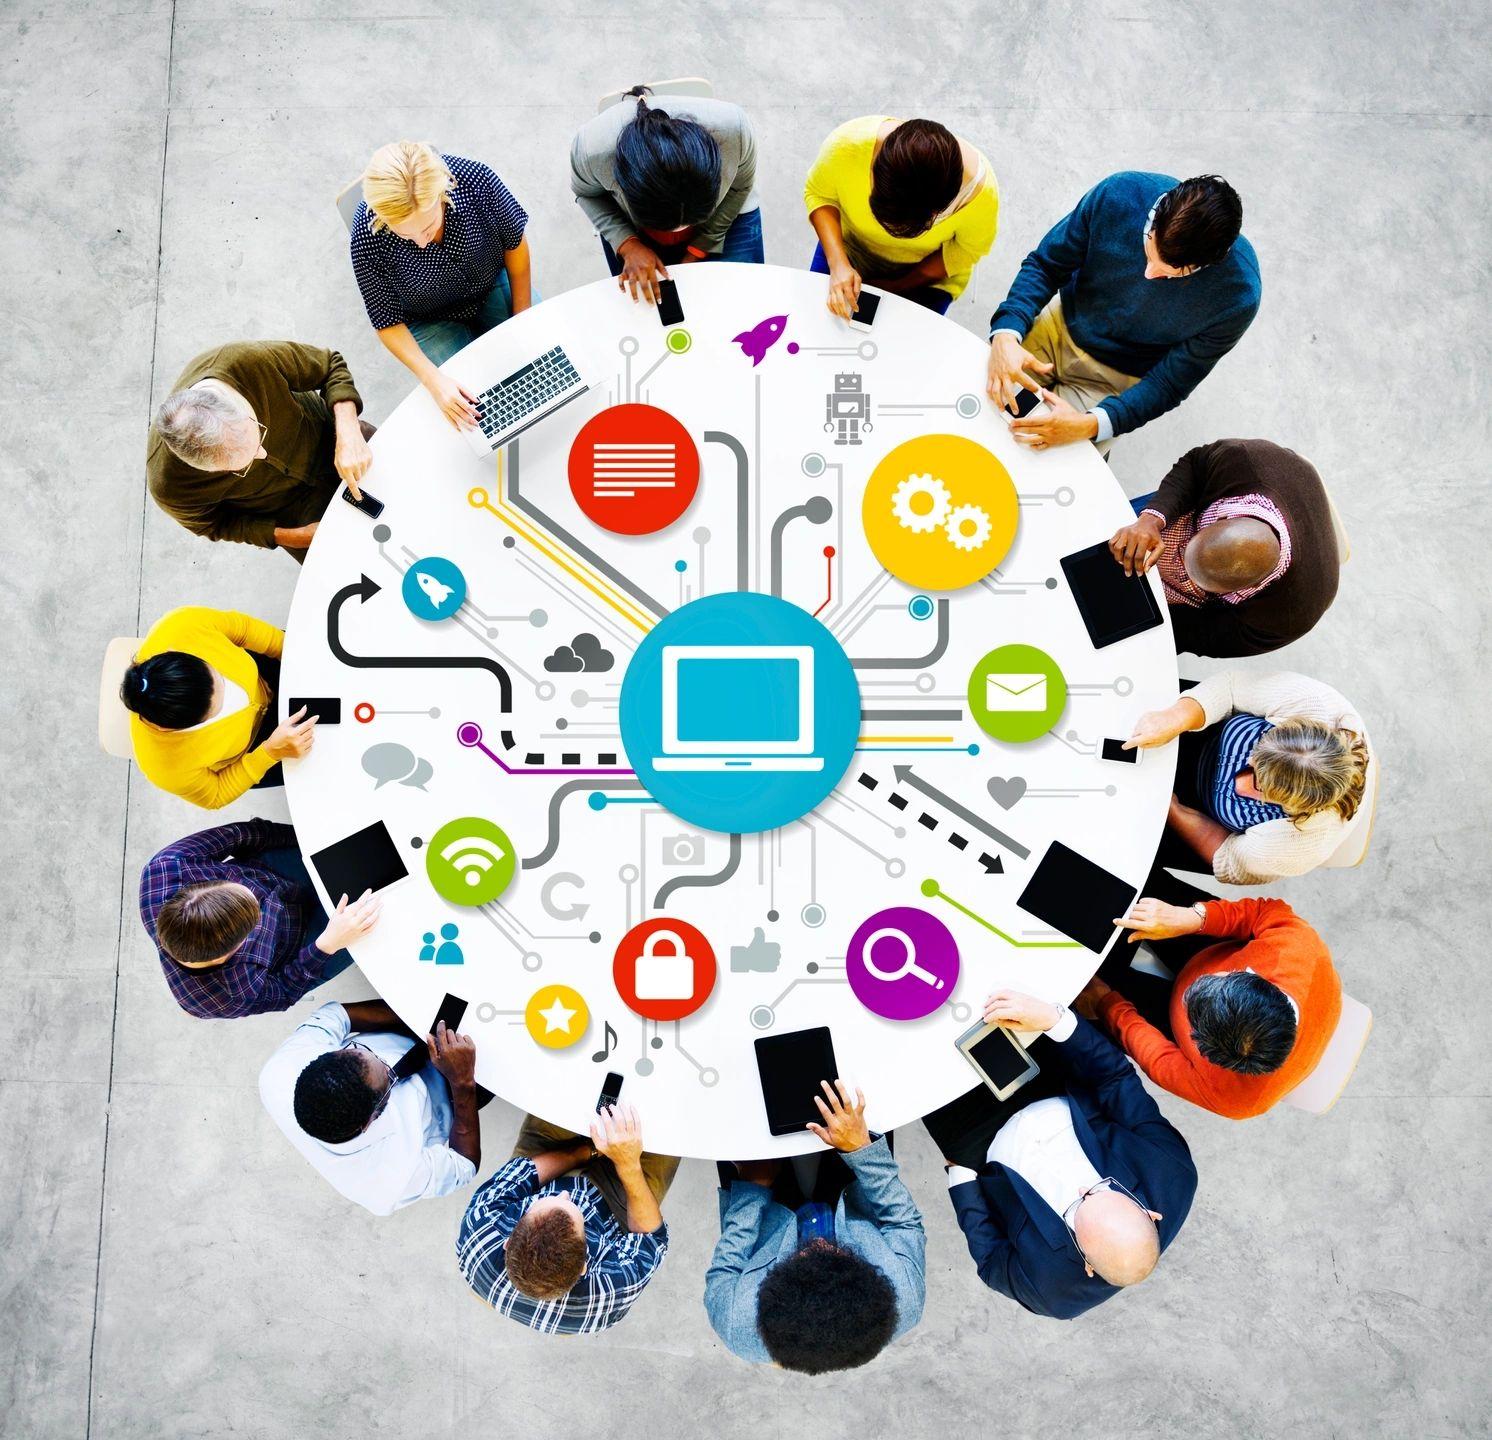 International Conference on Digital Marketing Experiences